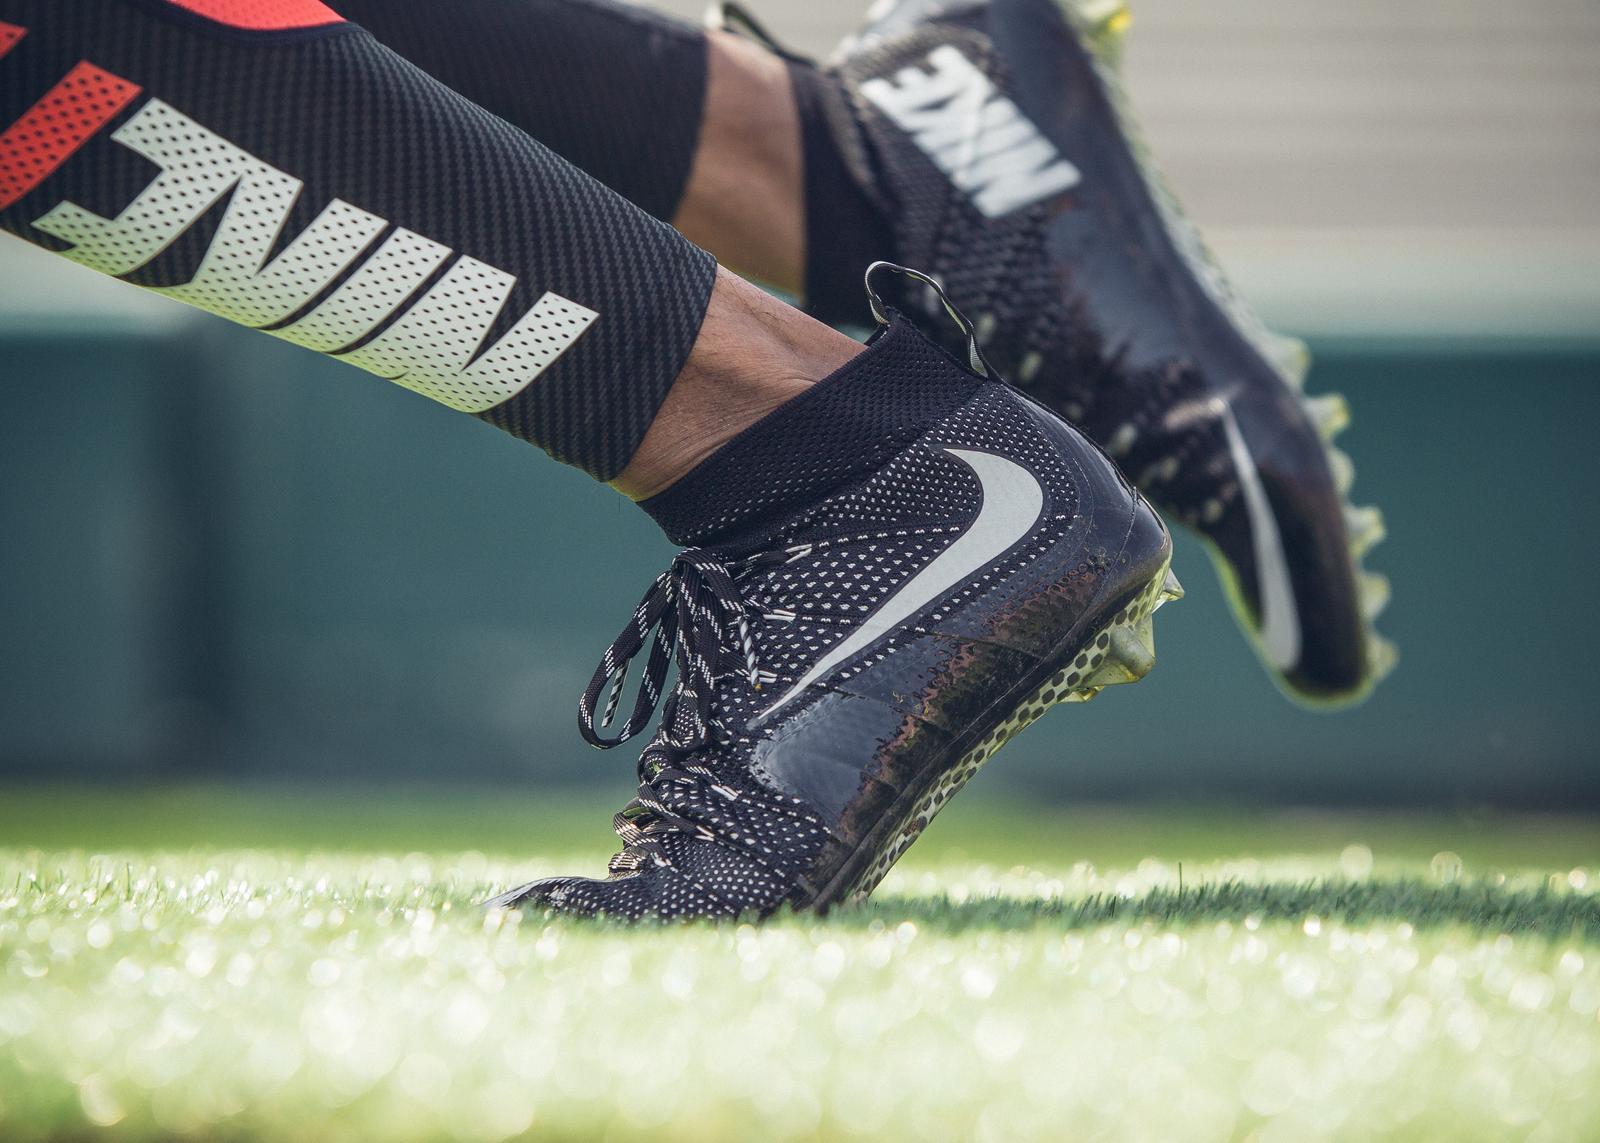 new nike football cleats 2016